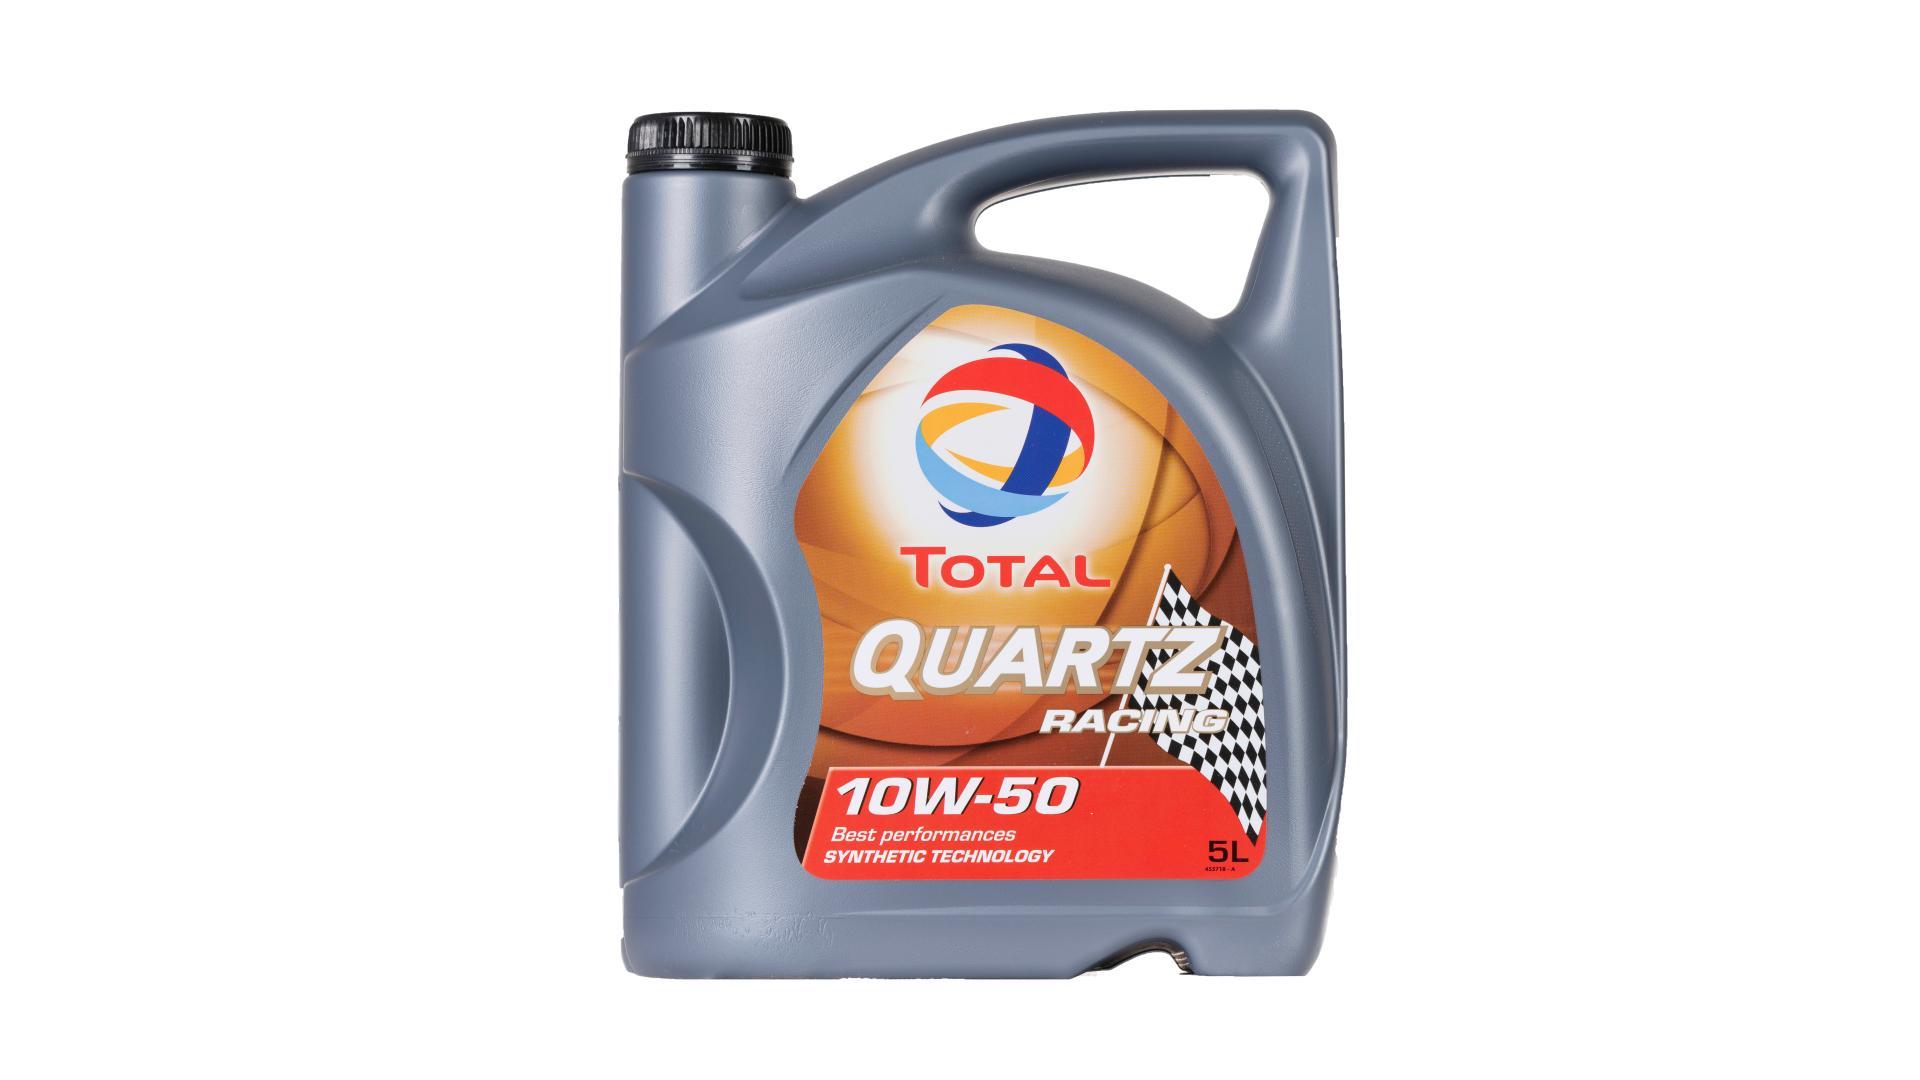 Total 10w-50 Racing 5L (157104)